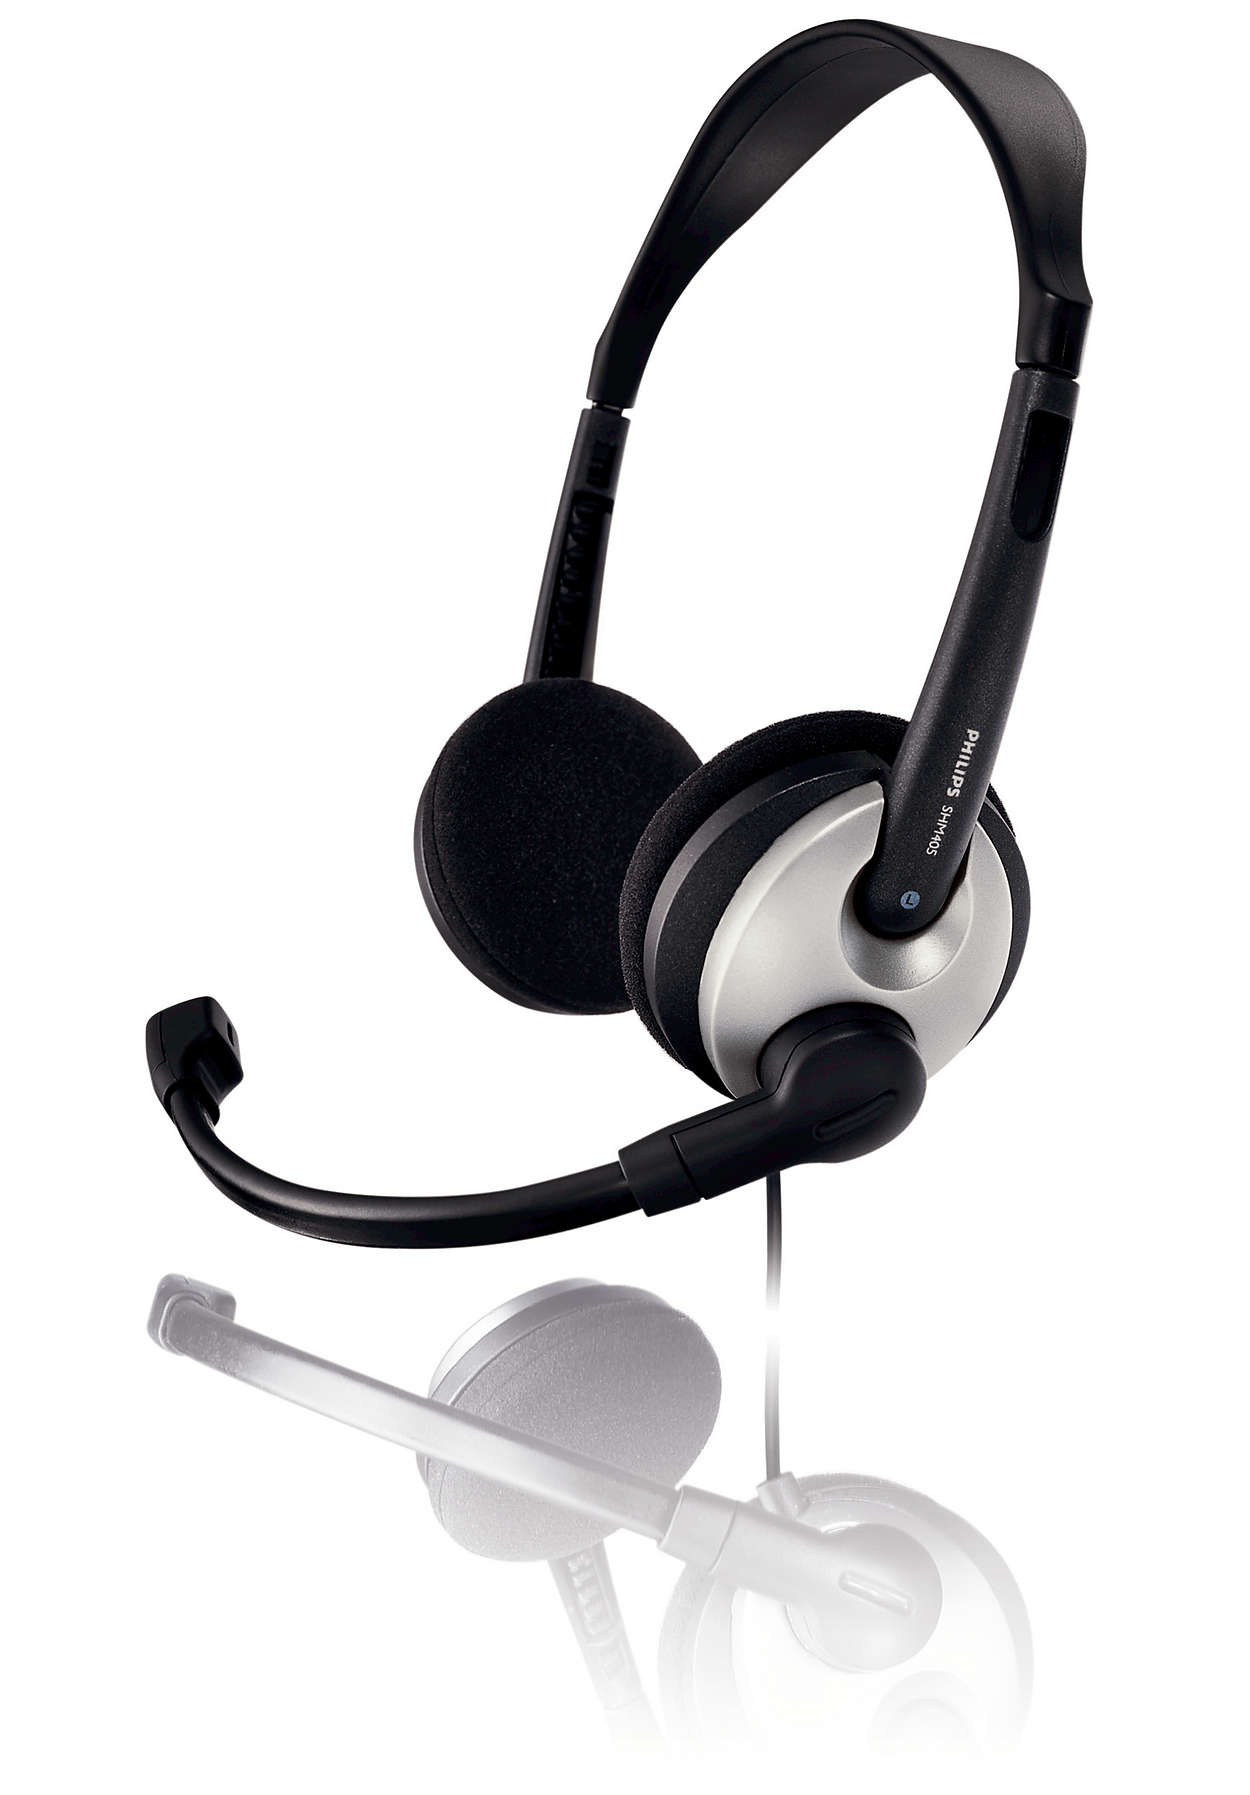 Lightweight headset